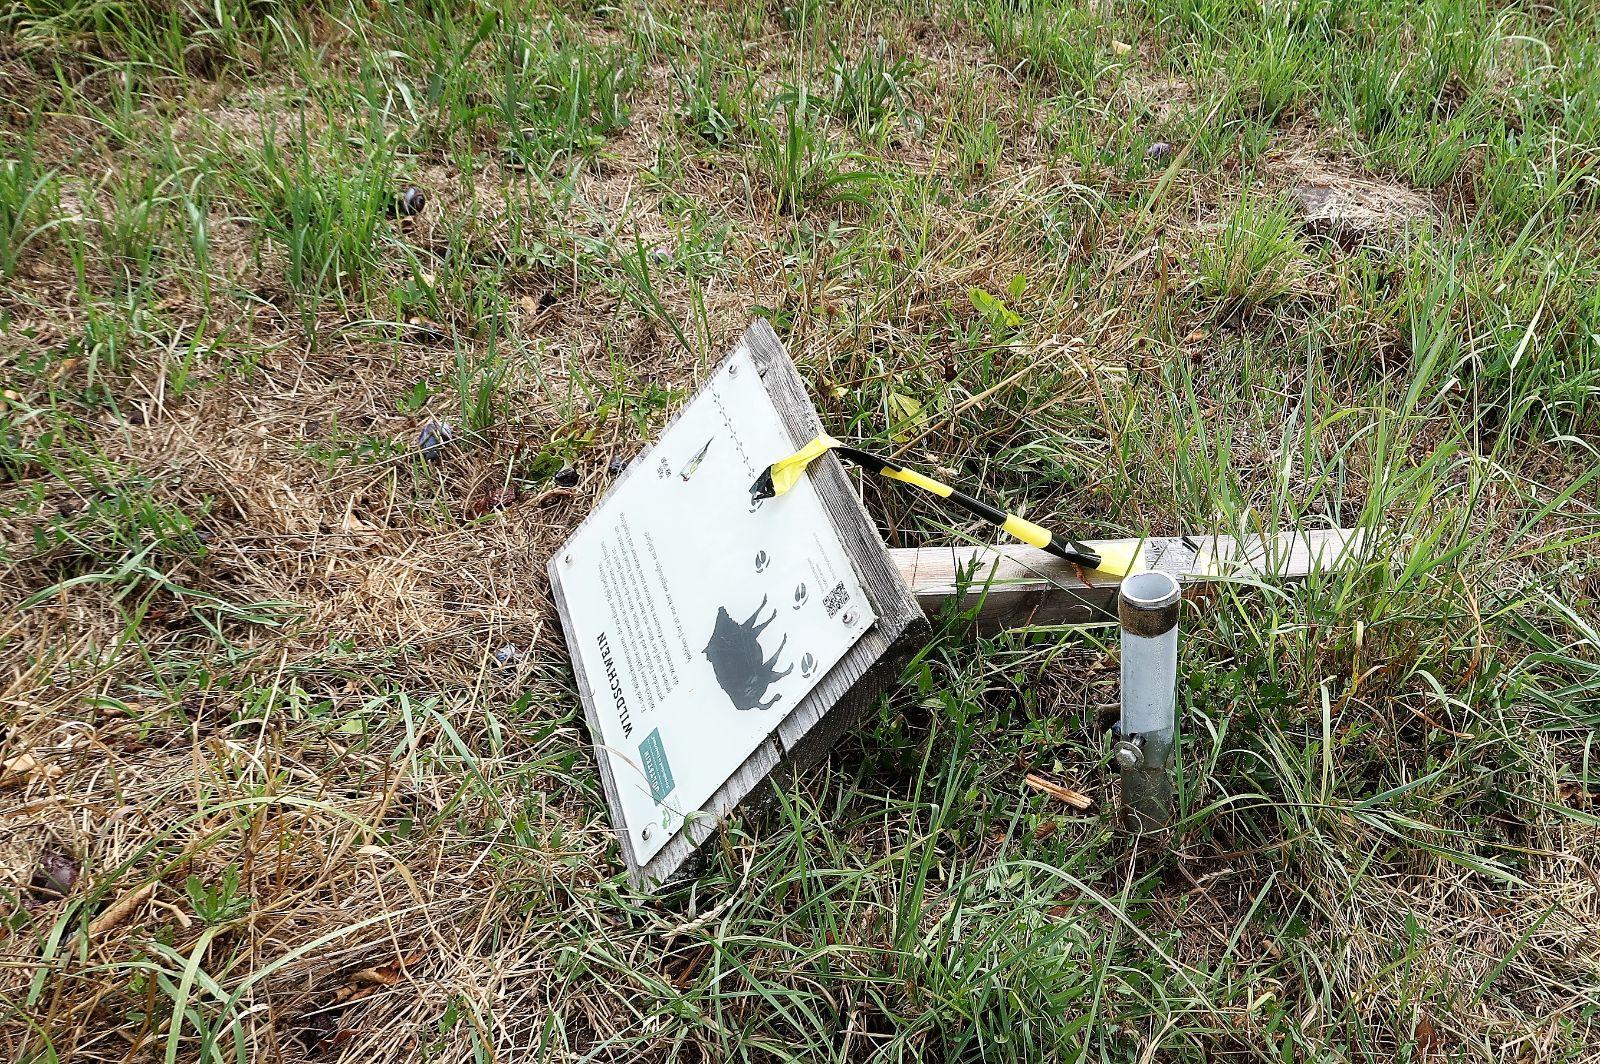 PM 246: Tafeln in Gültstein zerstört